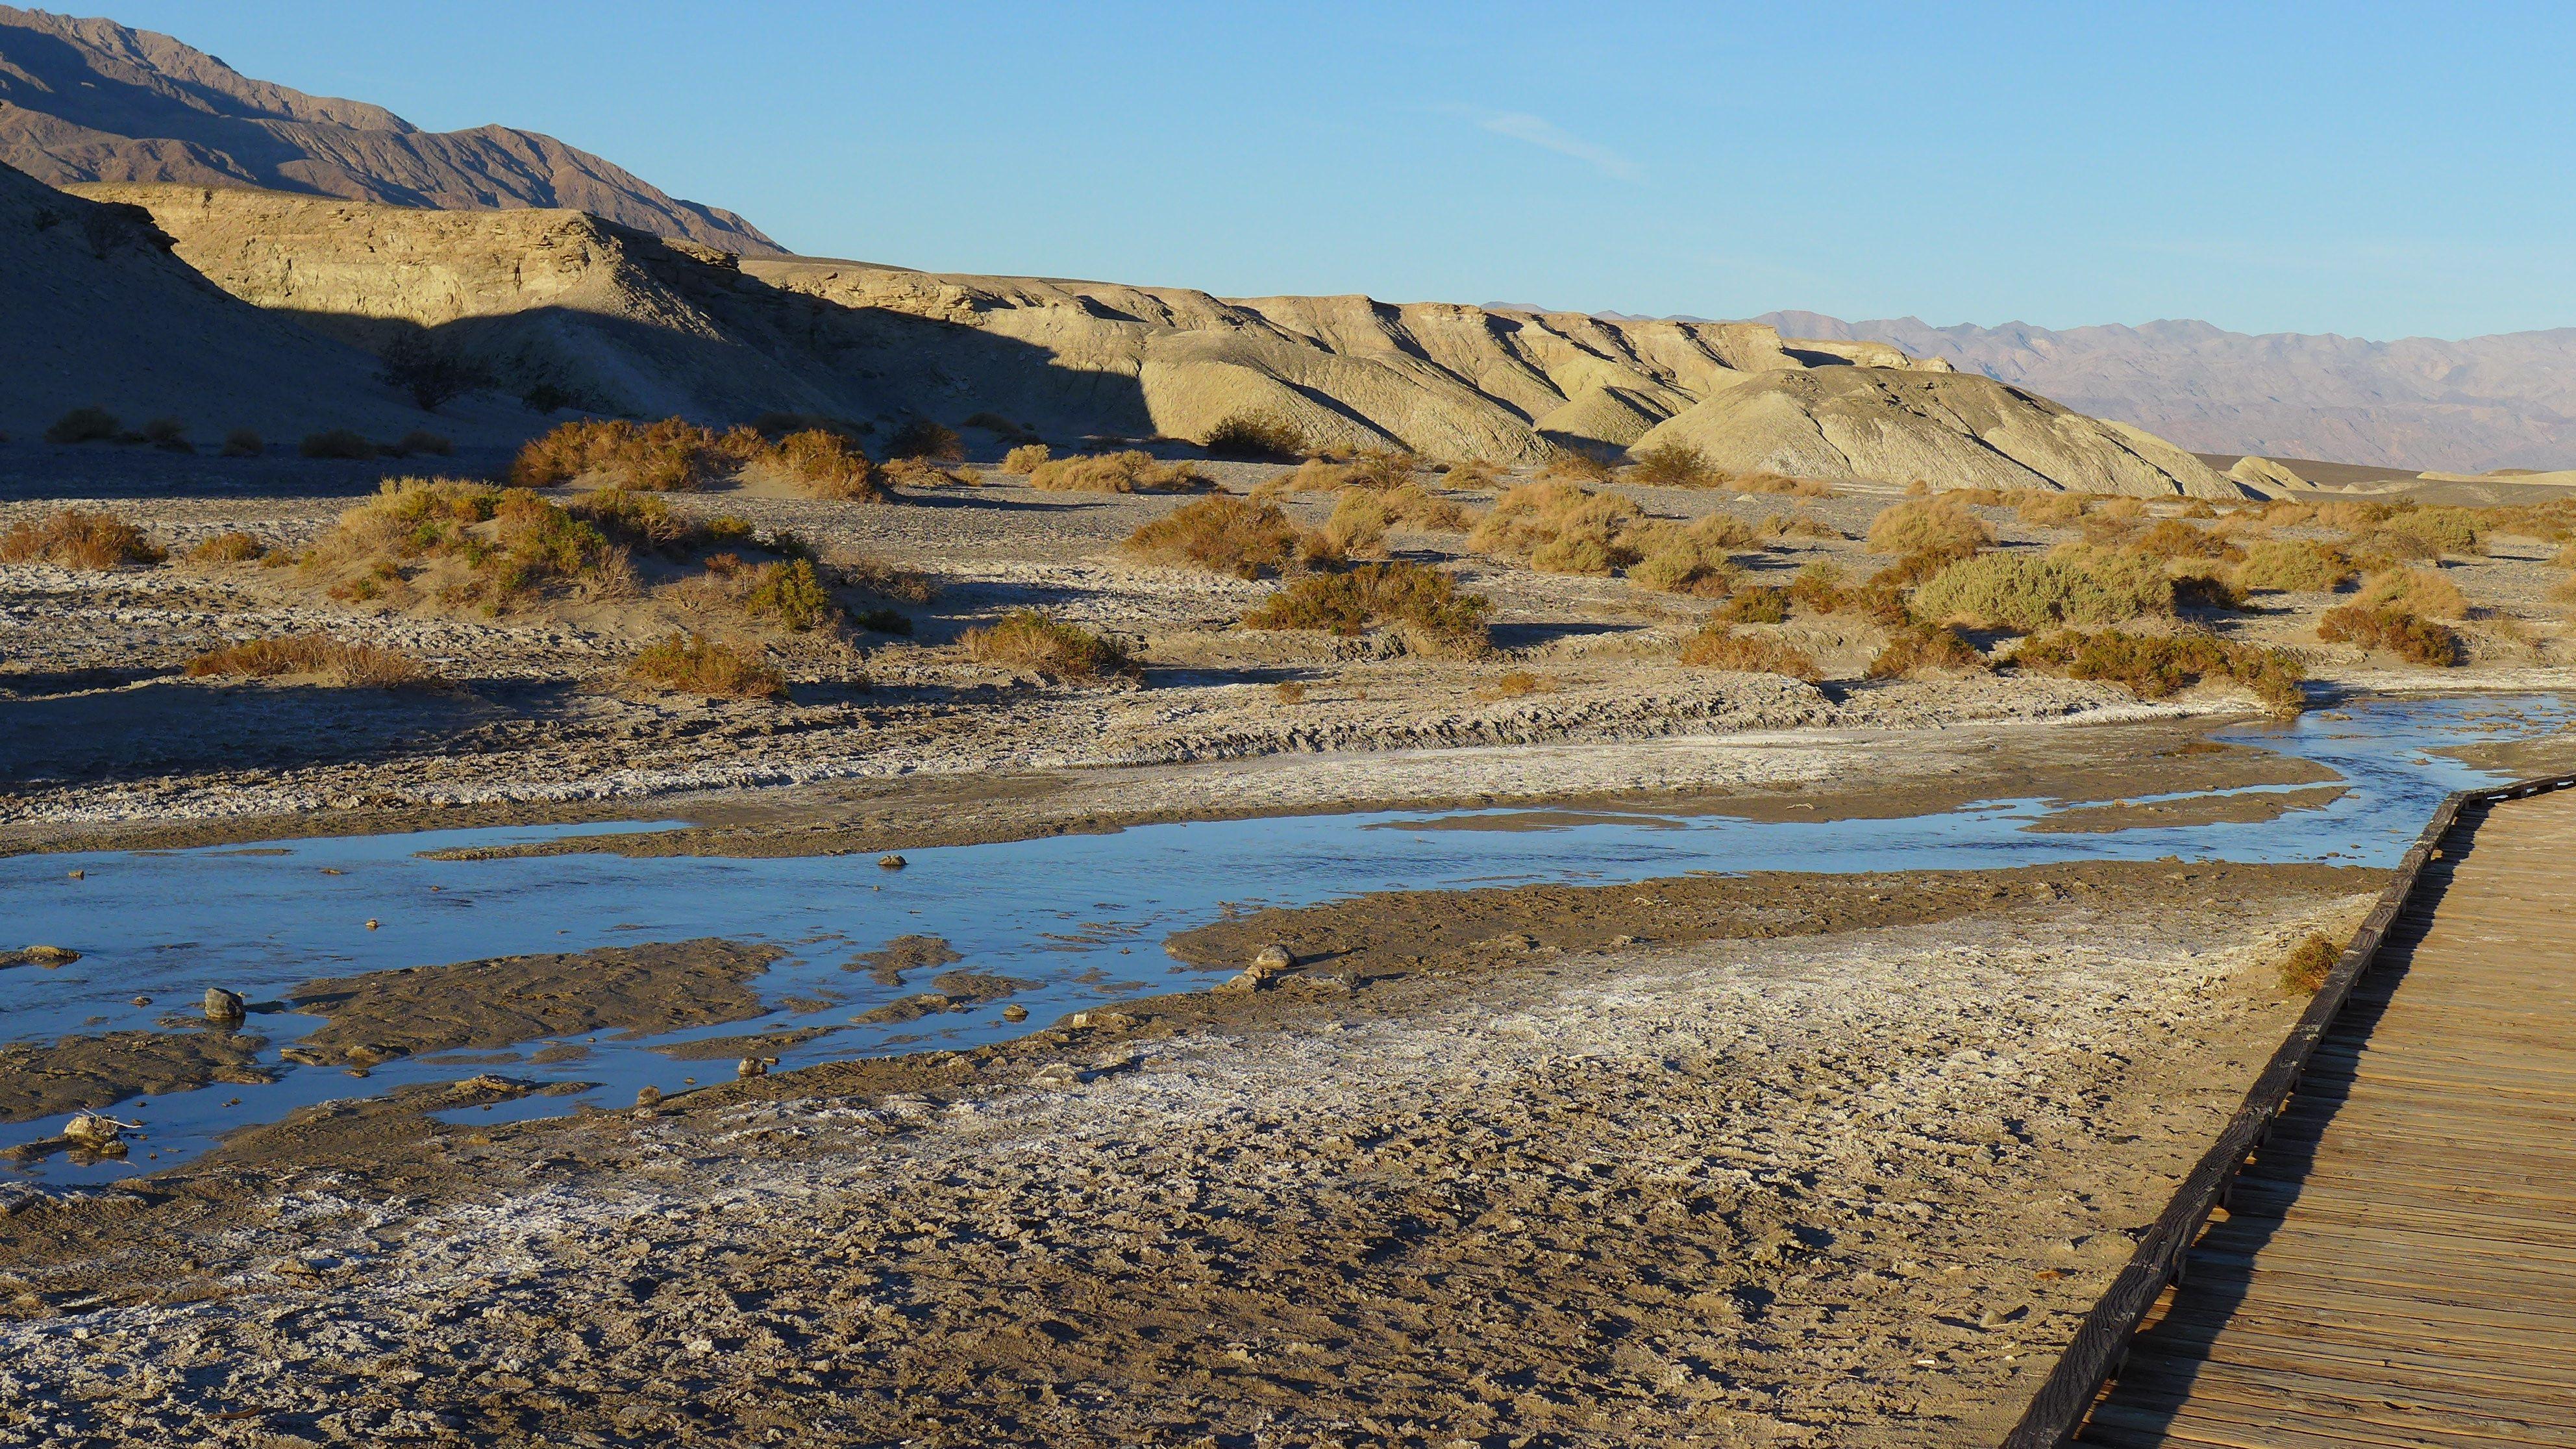 Death Valley, salt marshes. Photo by Adrienne Neff. www.adrienneneff.com